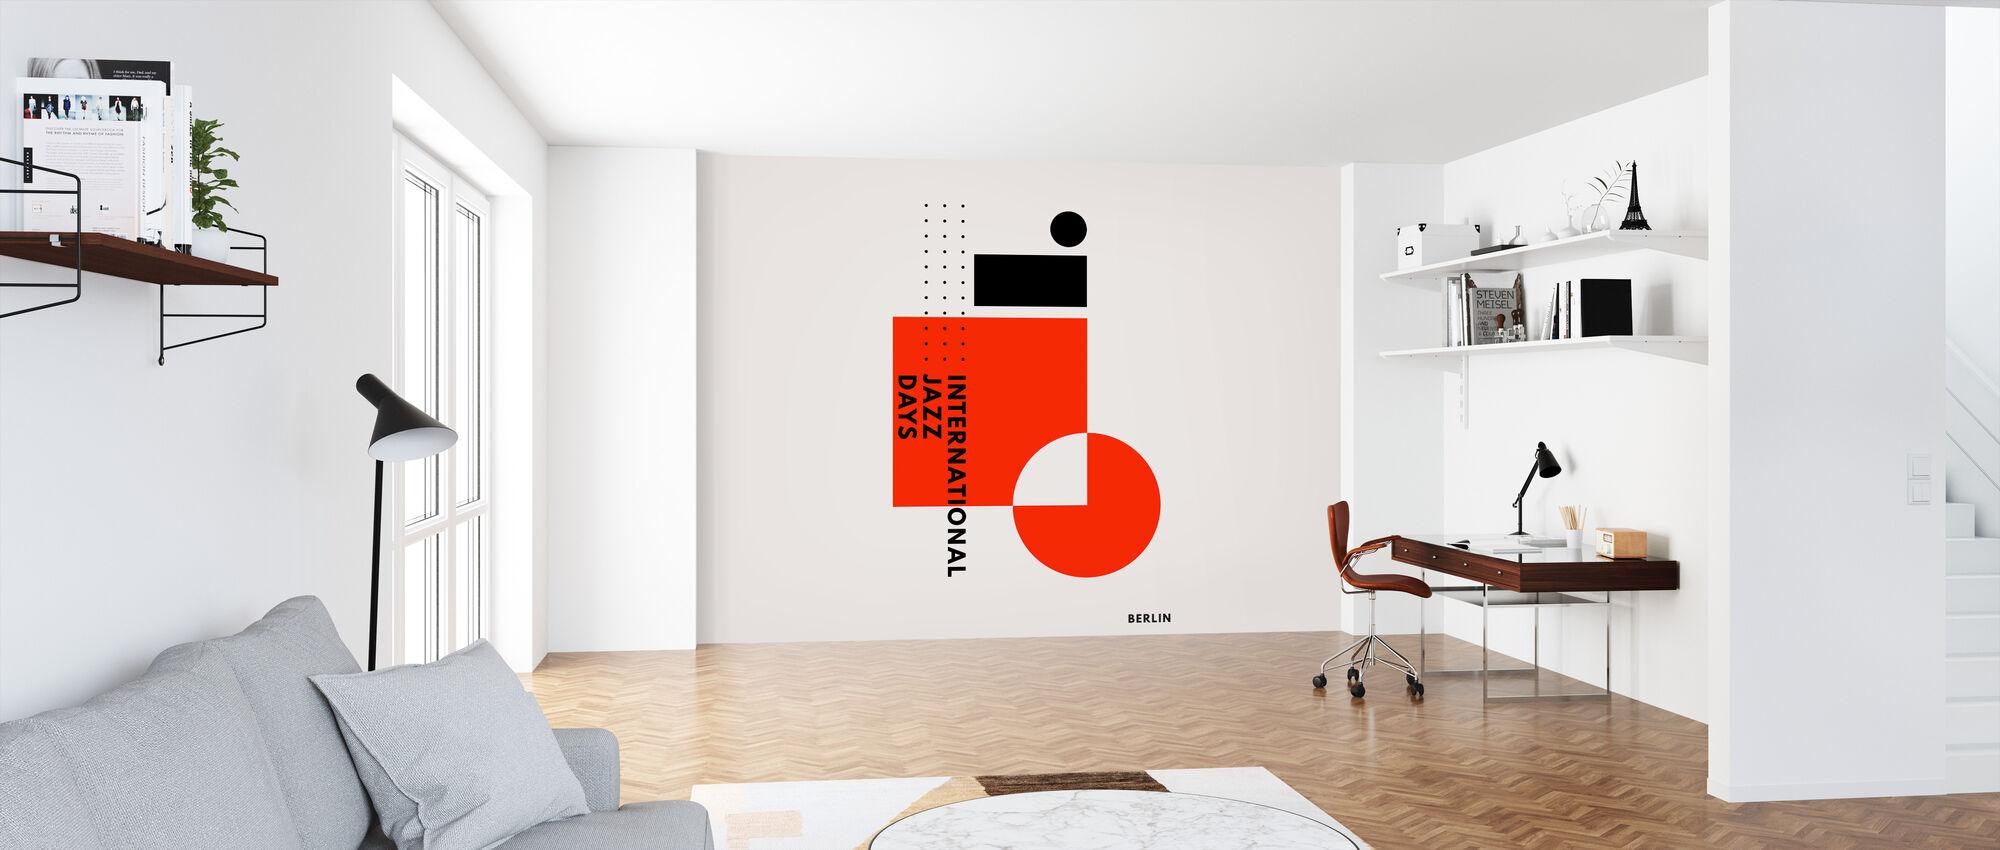 Jazz Days Berlin - Wallpaper - Office